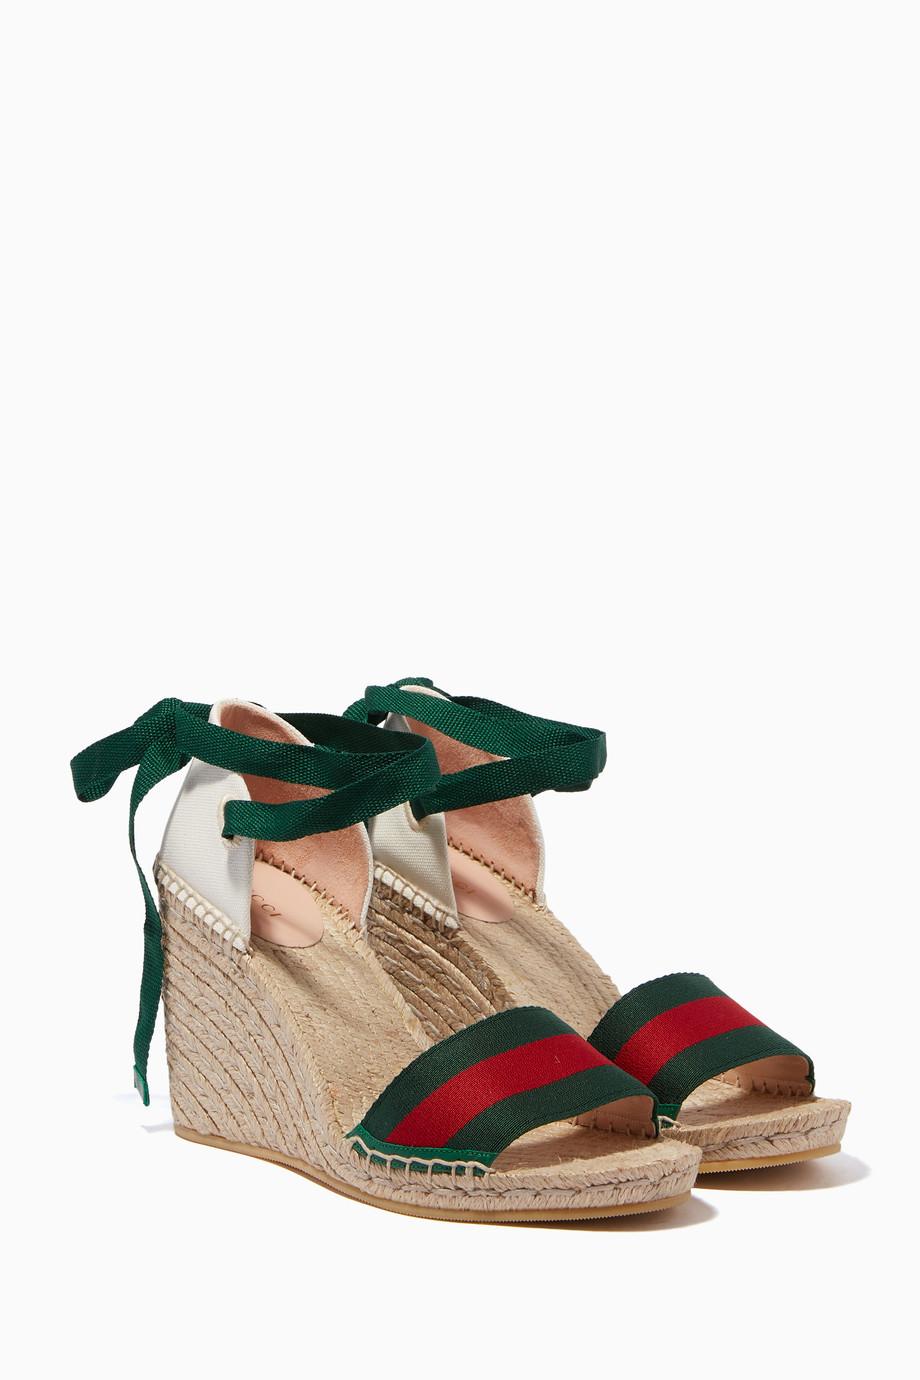 1fff50589df3 Shop Gucci Multicolour Multi-Coloured Lilibeth Web Espadrille Wedges ...